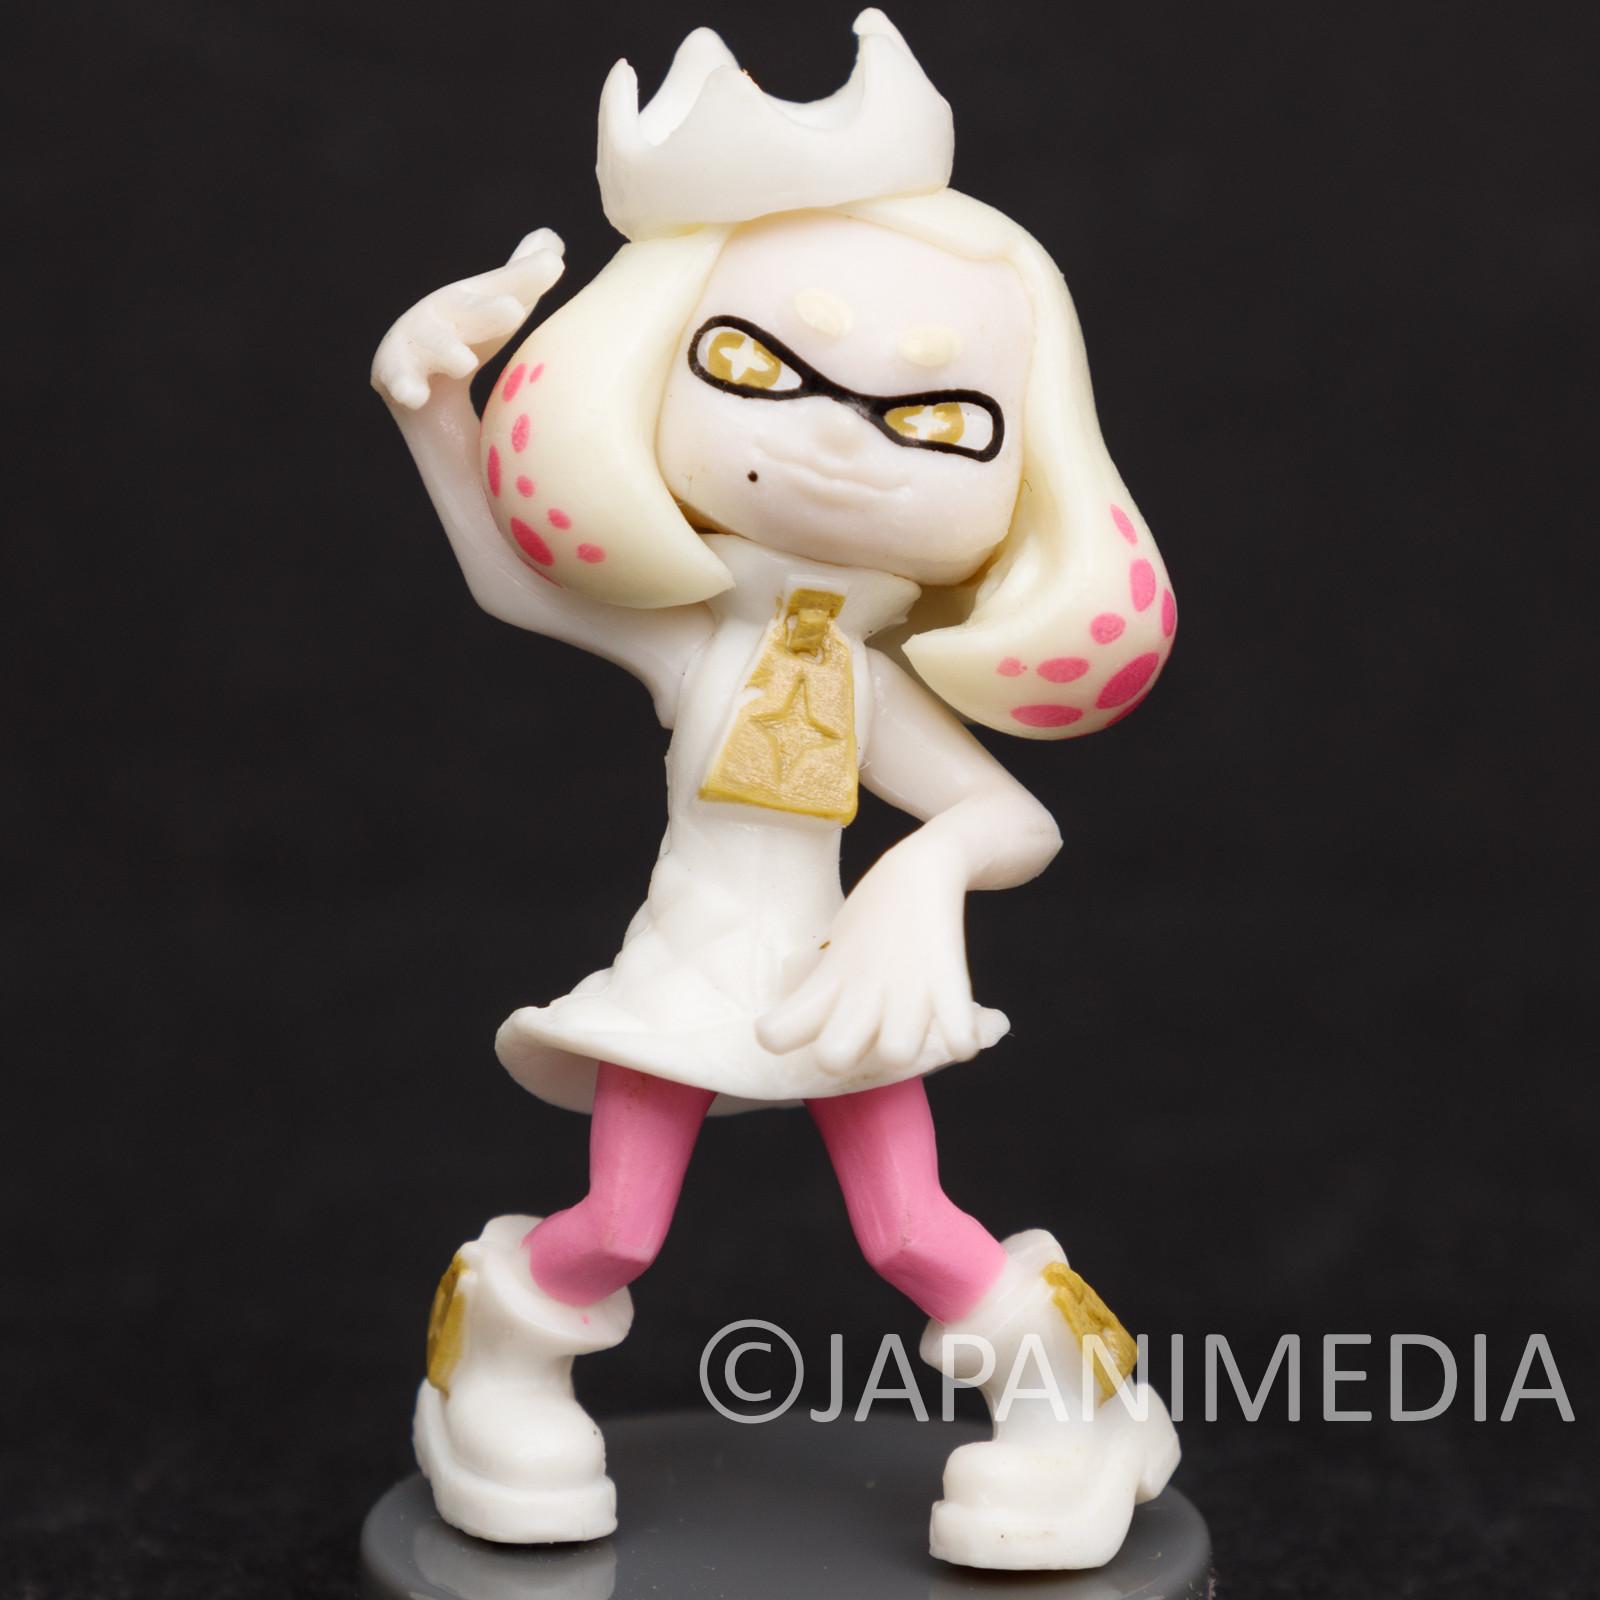 Splatoon 2 Off the Hook Pearl Choco-egg Mini Figure JAPAN SWITCH